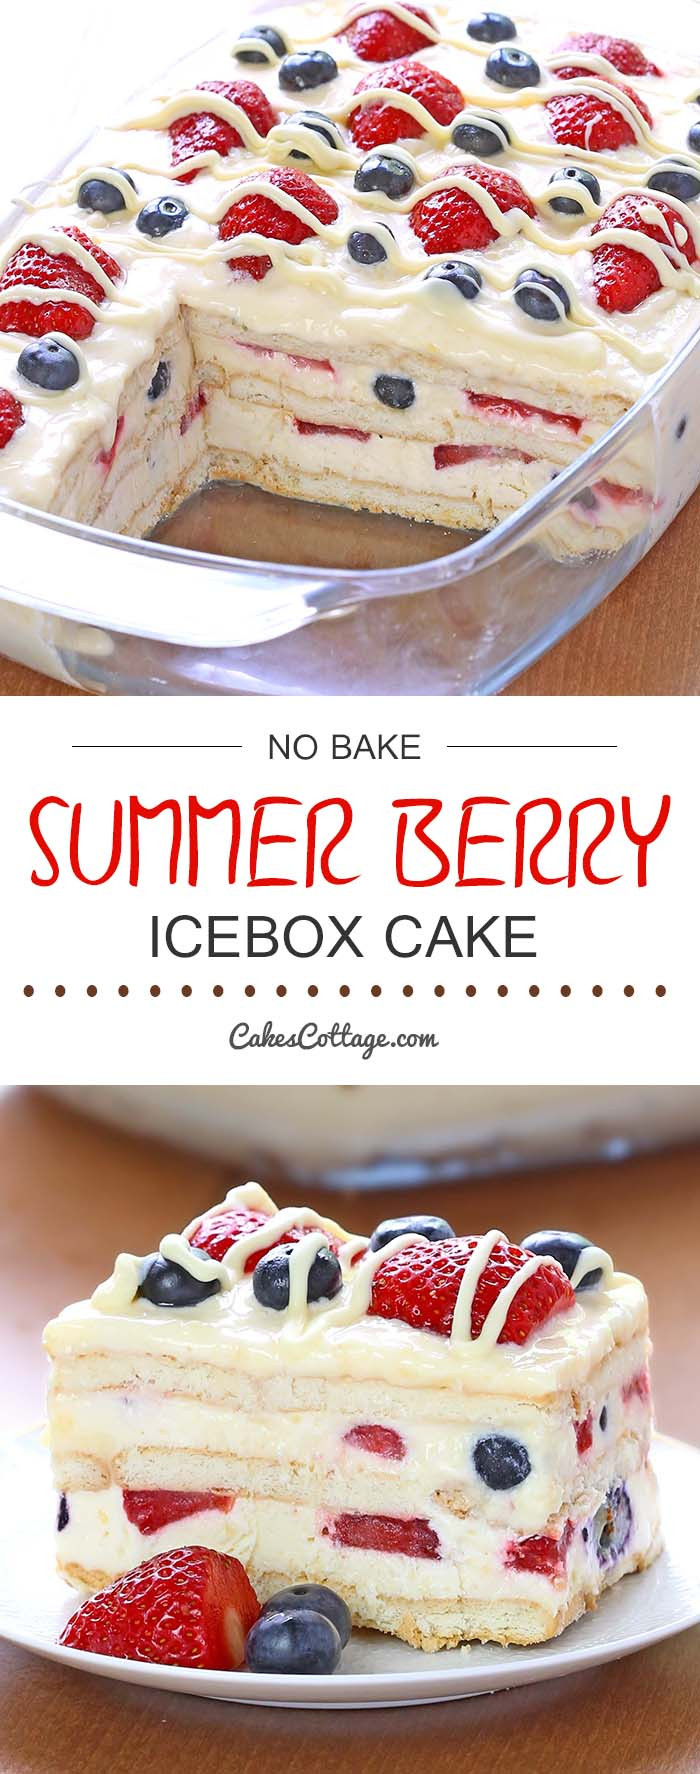 Summer Desserts No Bake  No Bake Summer Berry Icebox Cake Cakescottage